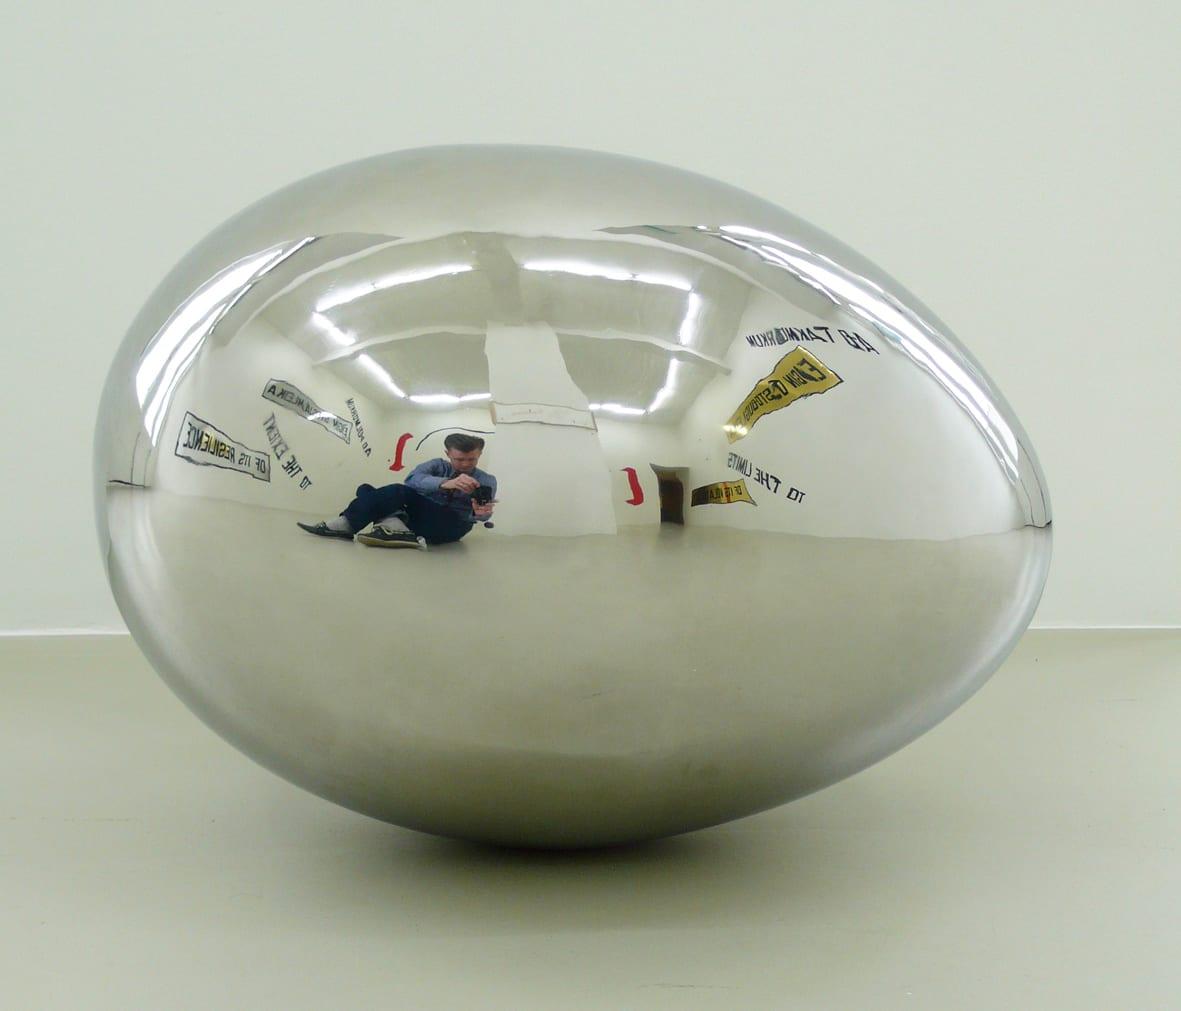 "<span class=""link fancybox-details-link""><a href=""/artists/30-sigurur-gumundsson/works/5776/"">View Detail Page</a></span><div class=""artist""><strong>SIGURÐUR GUÐMUNDSSON</strong></div> <div class=""title""><em>Untitled (egg)</em>, 2009</div> <div class=""medium"">stainless steel</div> <div class=""dimensions"">height: 34 cm<br />width: 49 cm<br />perimeter: 110 cm</div>"